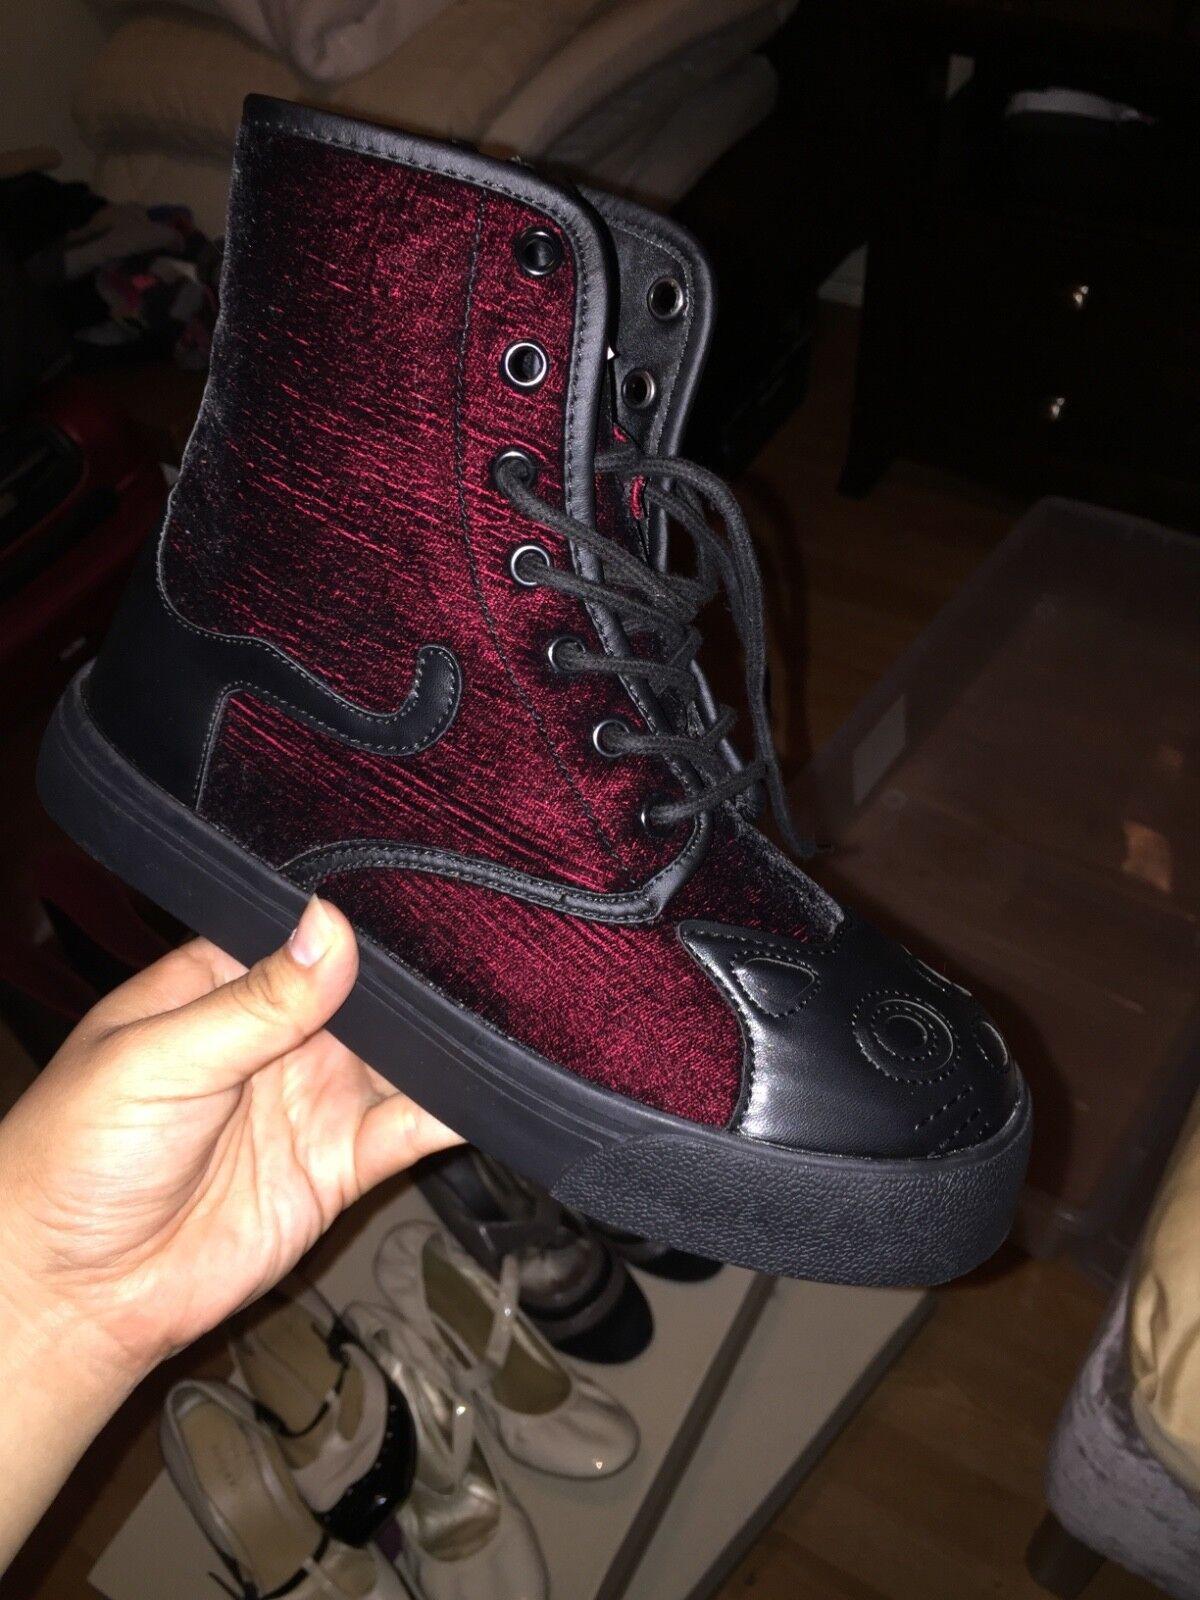 TUK kitty boot sneakers